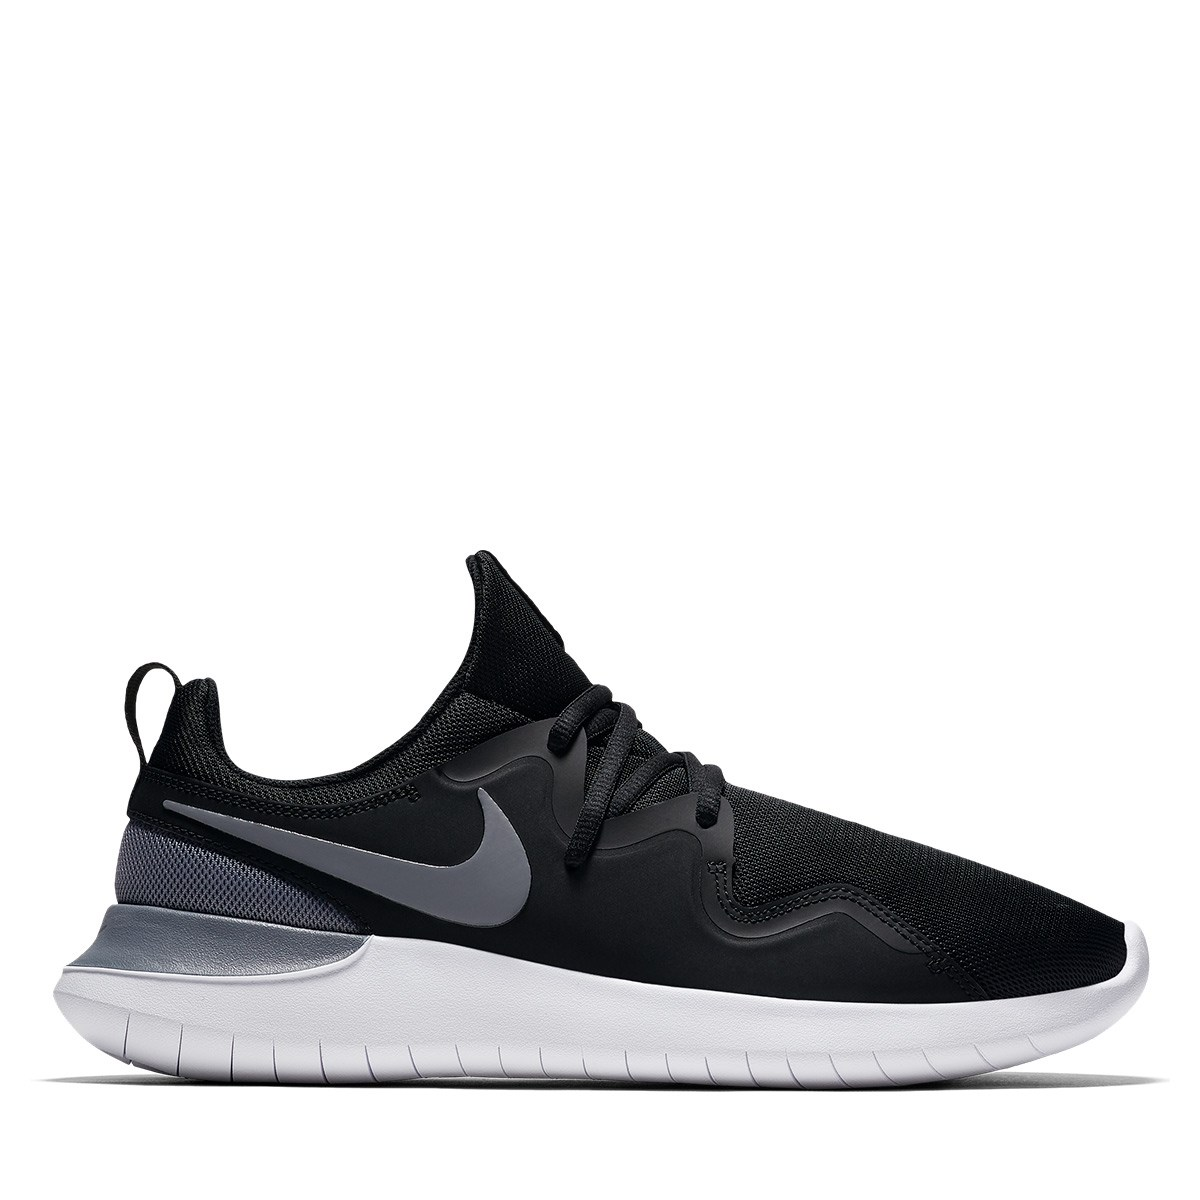 Men's Tessen Sneaker in Black